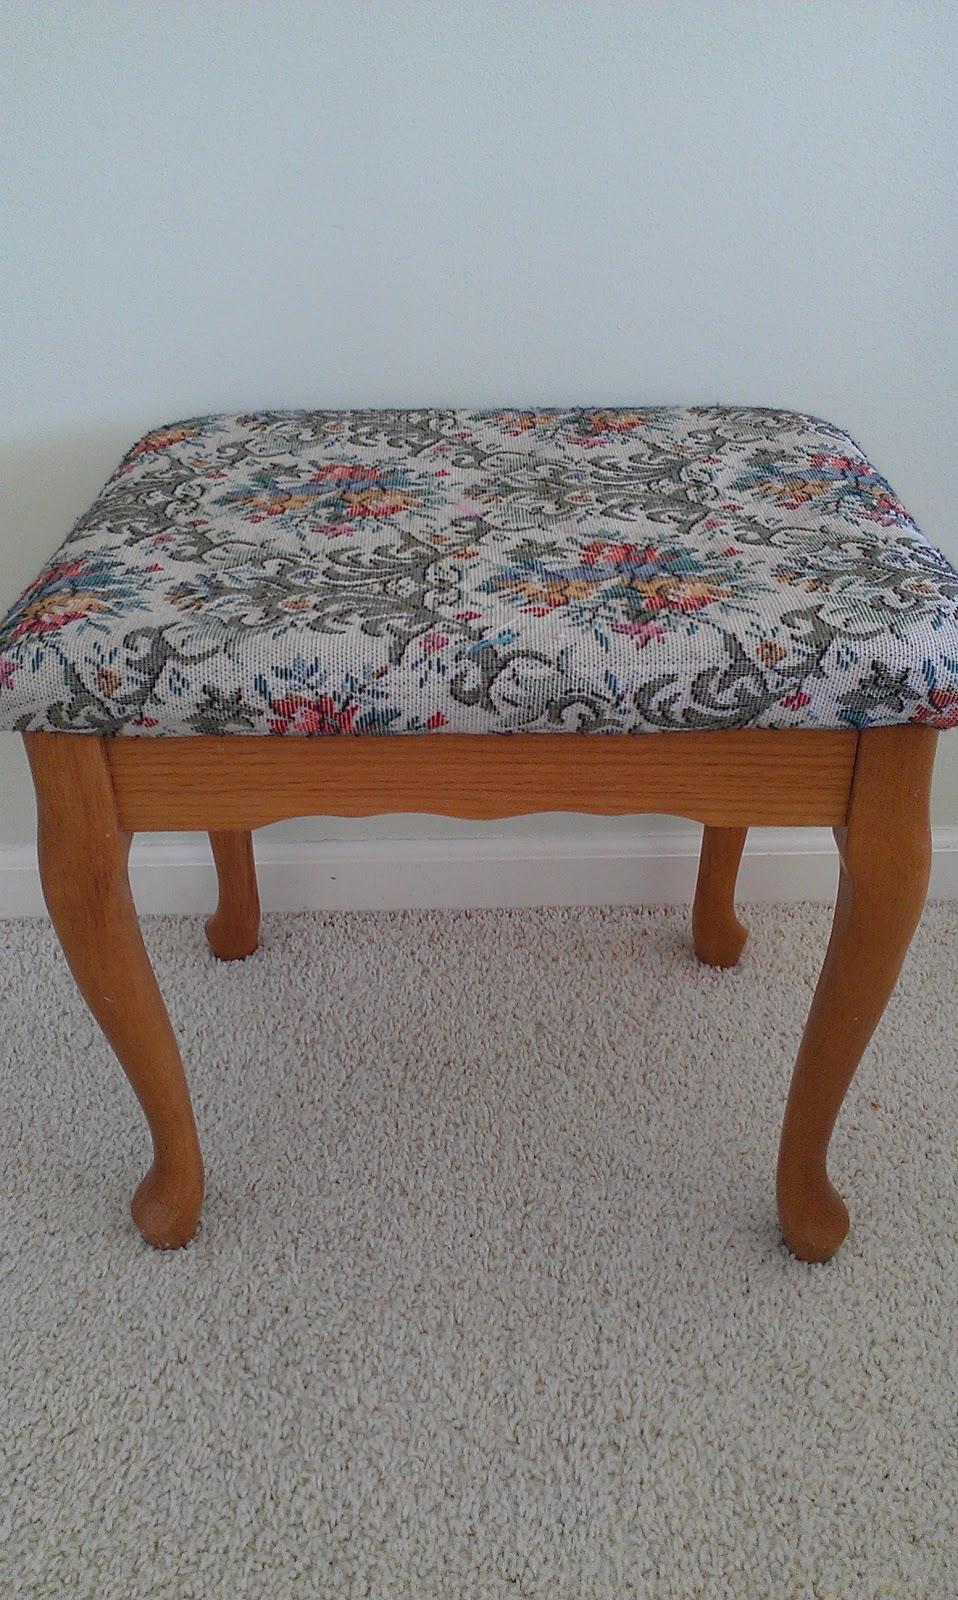 Brilliant Thrifty Treasures Chevron Vanity Bench Ibusinesslaw Wood Chair Design Ideas Ibusinesslaworg